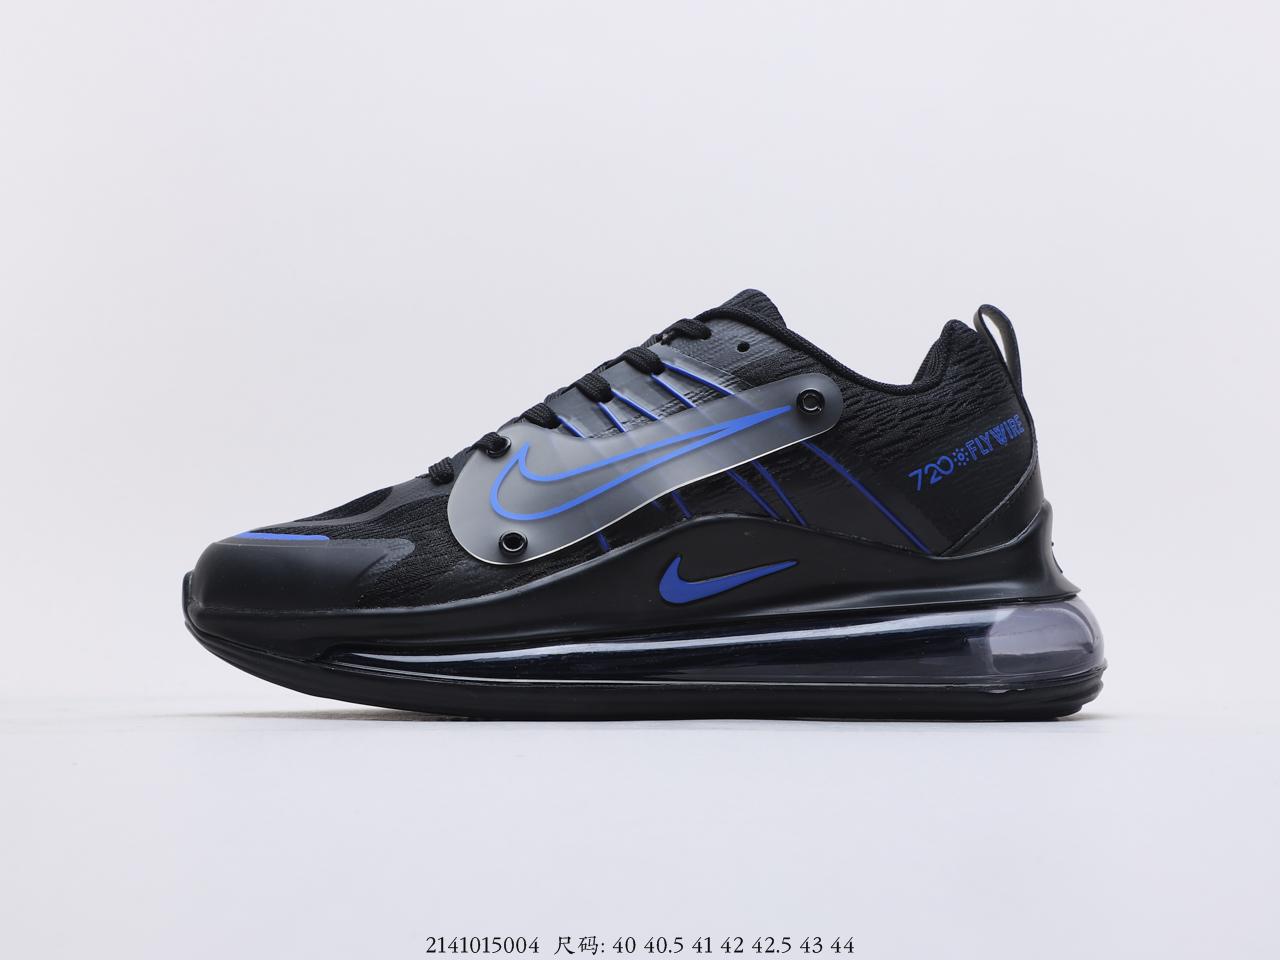 耐克Nike Air Max 720Throwback Future' 全掌气垫跑步鞋